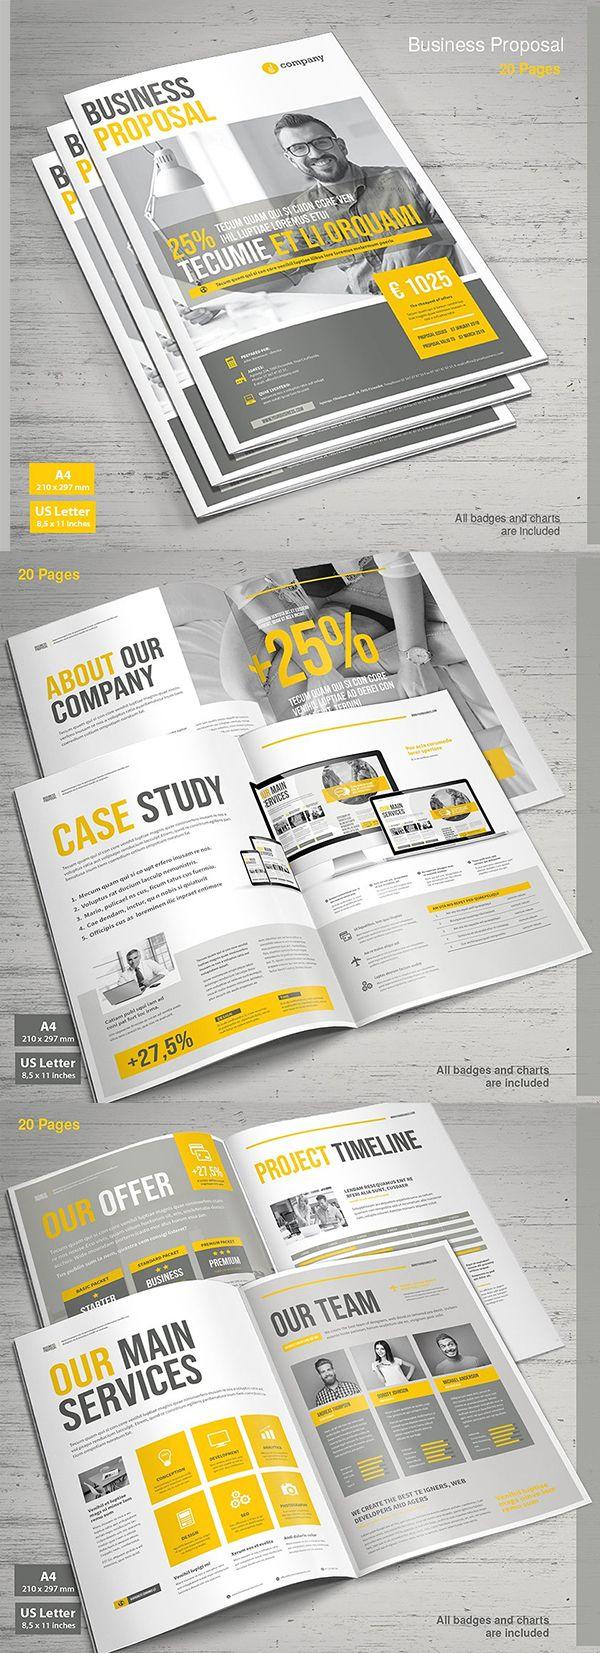 Professional Proposal Templates Professional Business Proposal Templates Design  15  Полиграфия .